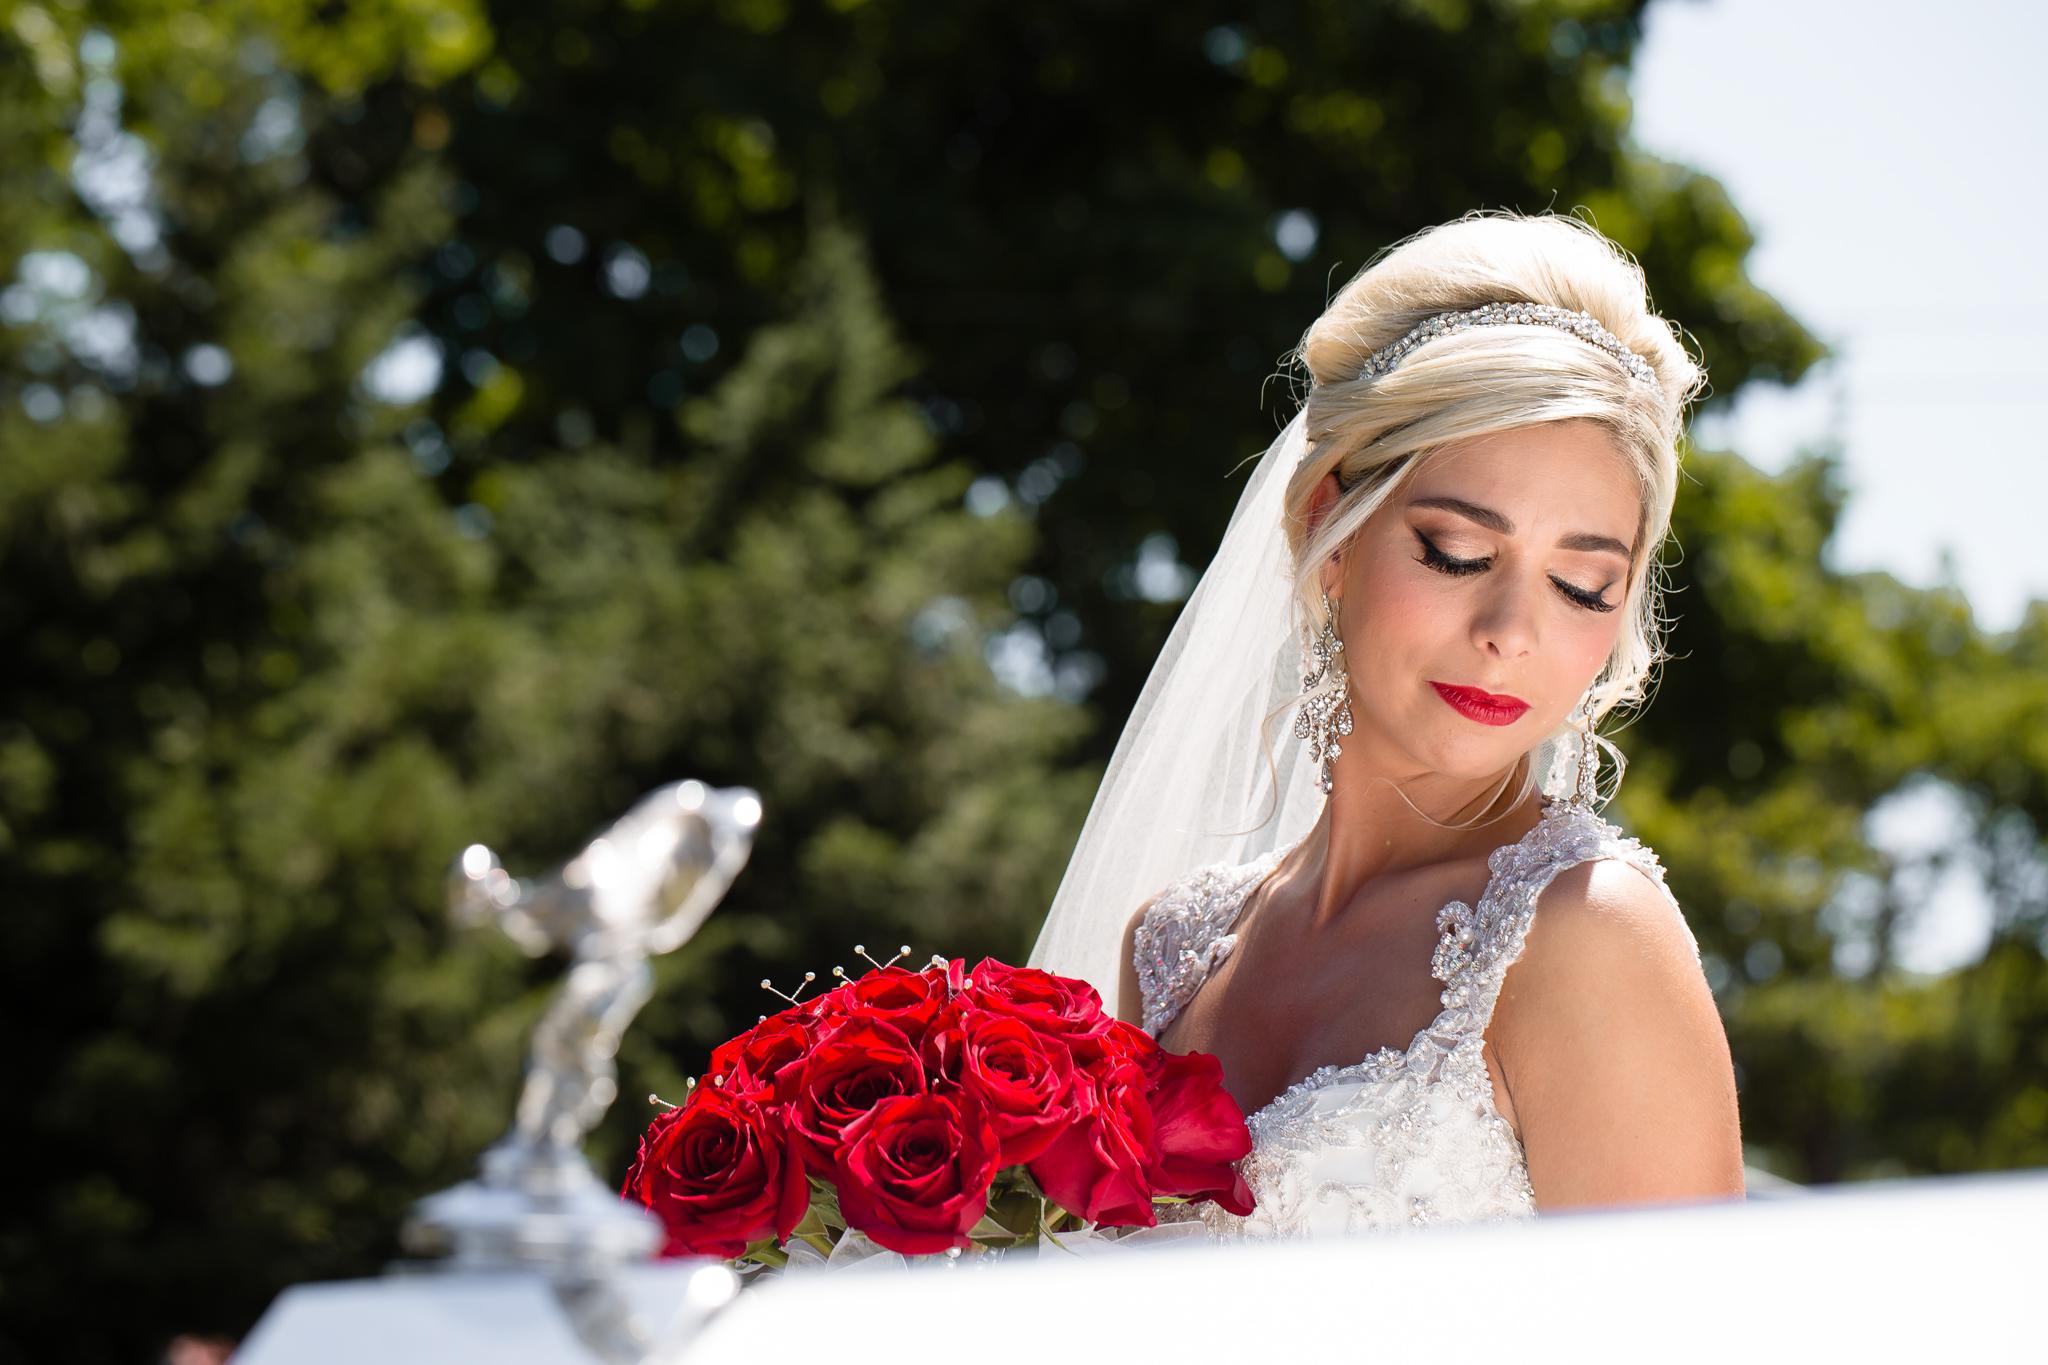 Statler-City-Buffalo-wedding-photographer- 0139.jpg